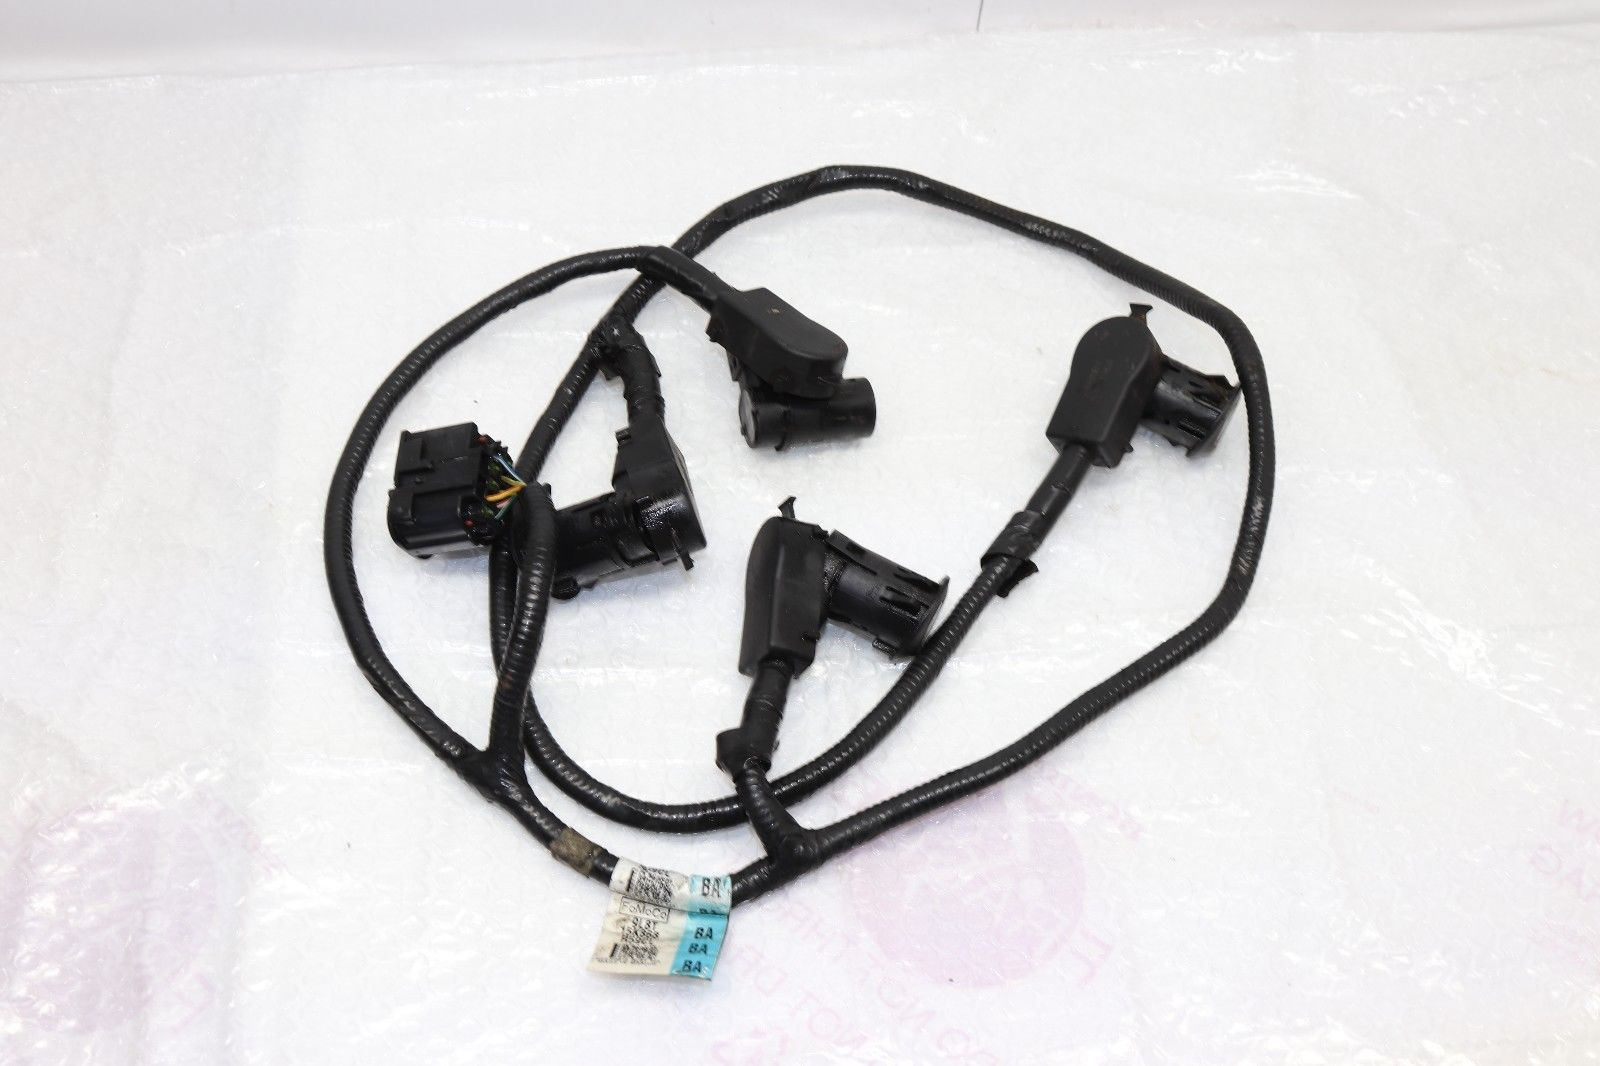 Brandmotion 9002-6511 2015 Ford F-150 OEM Camera Black Handle